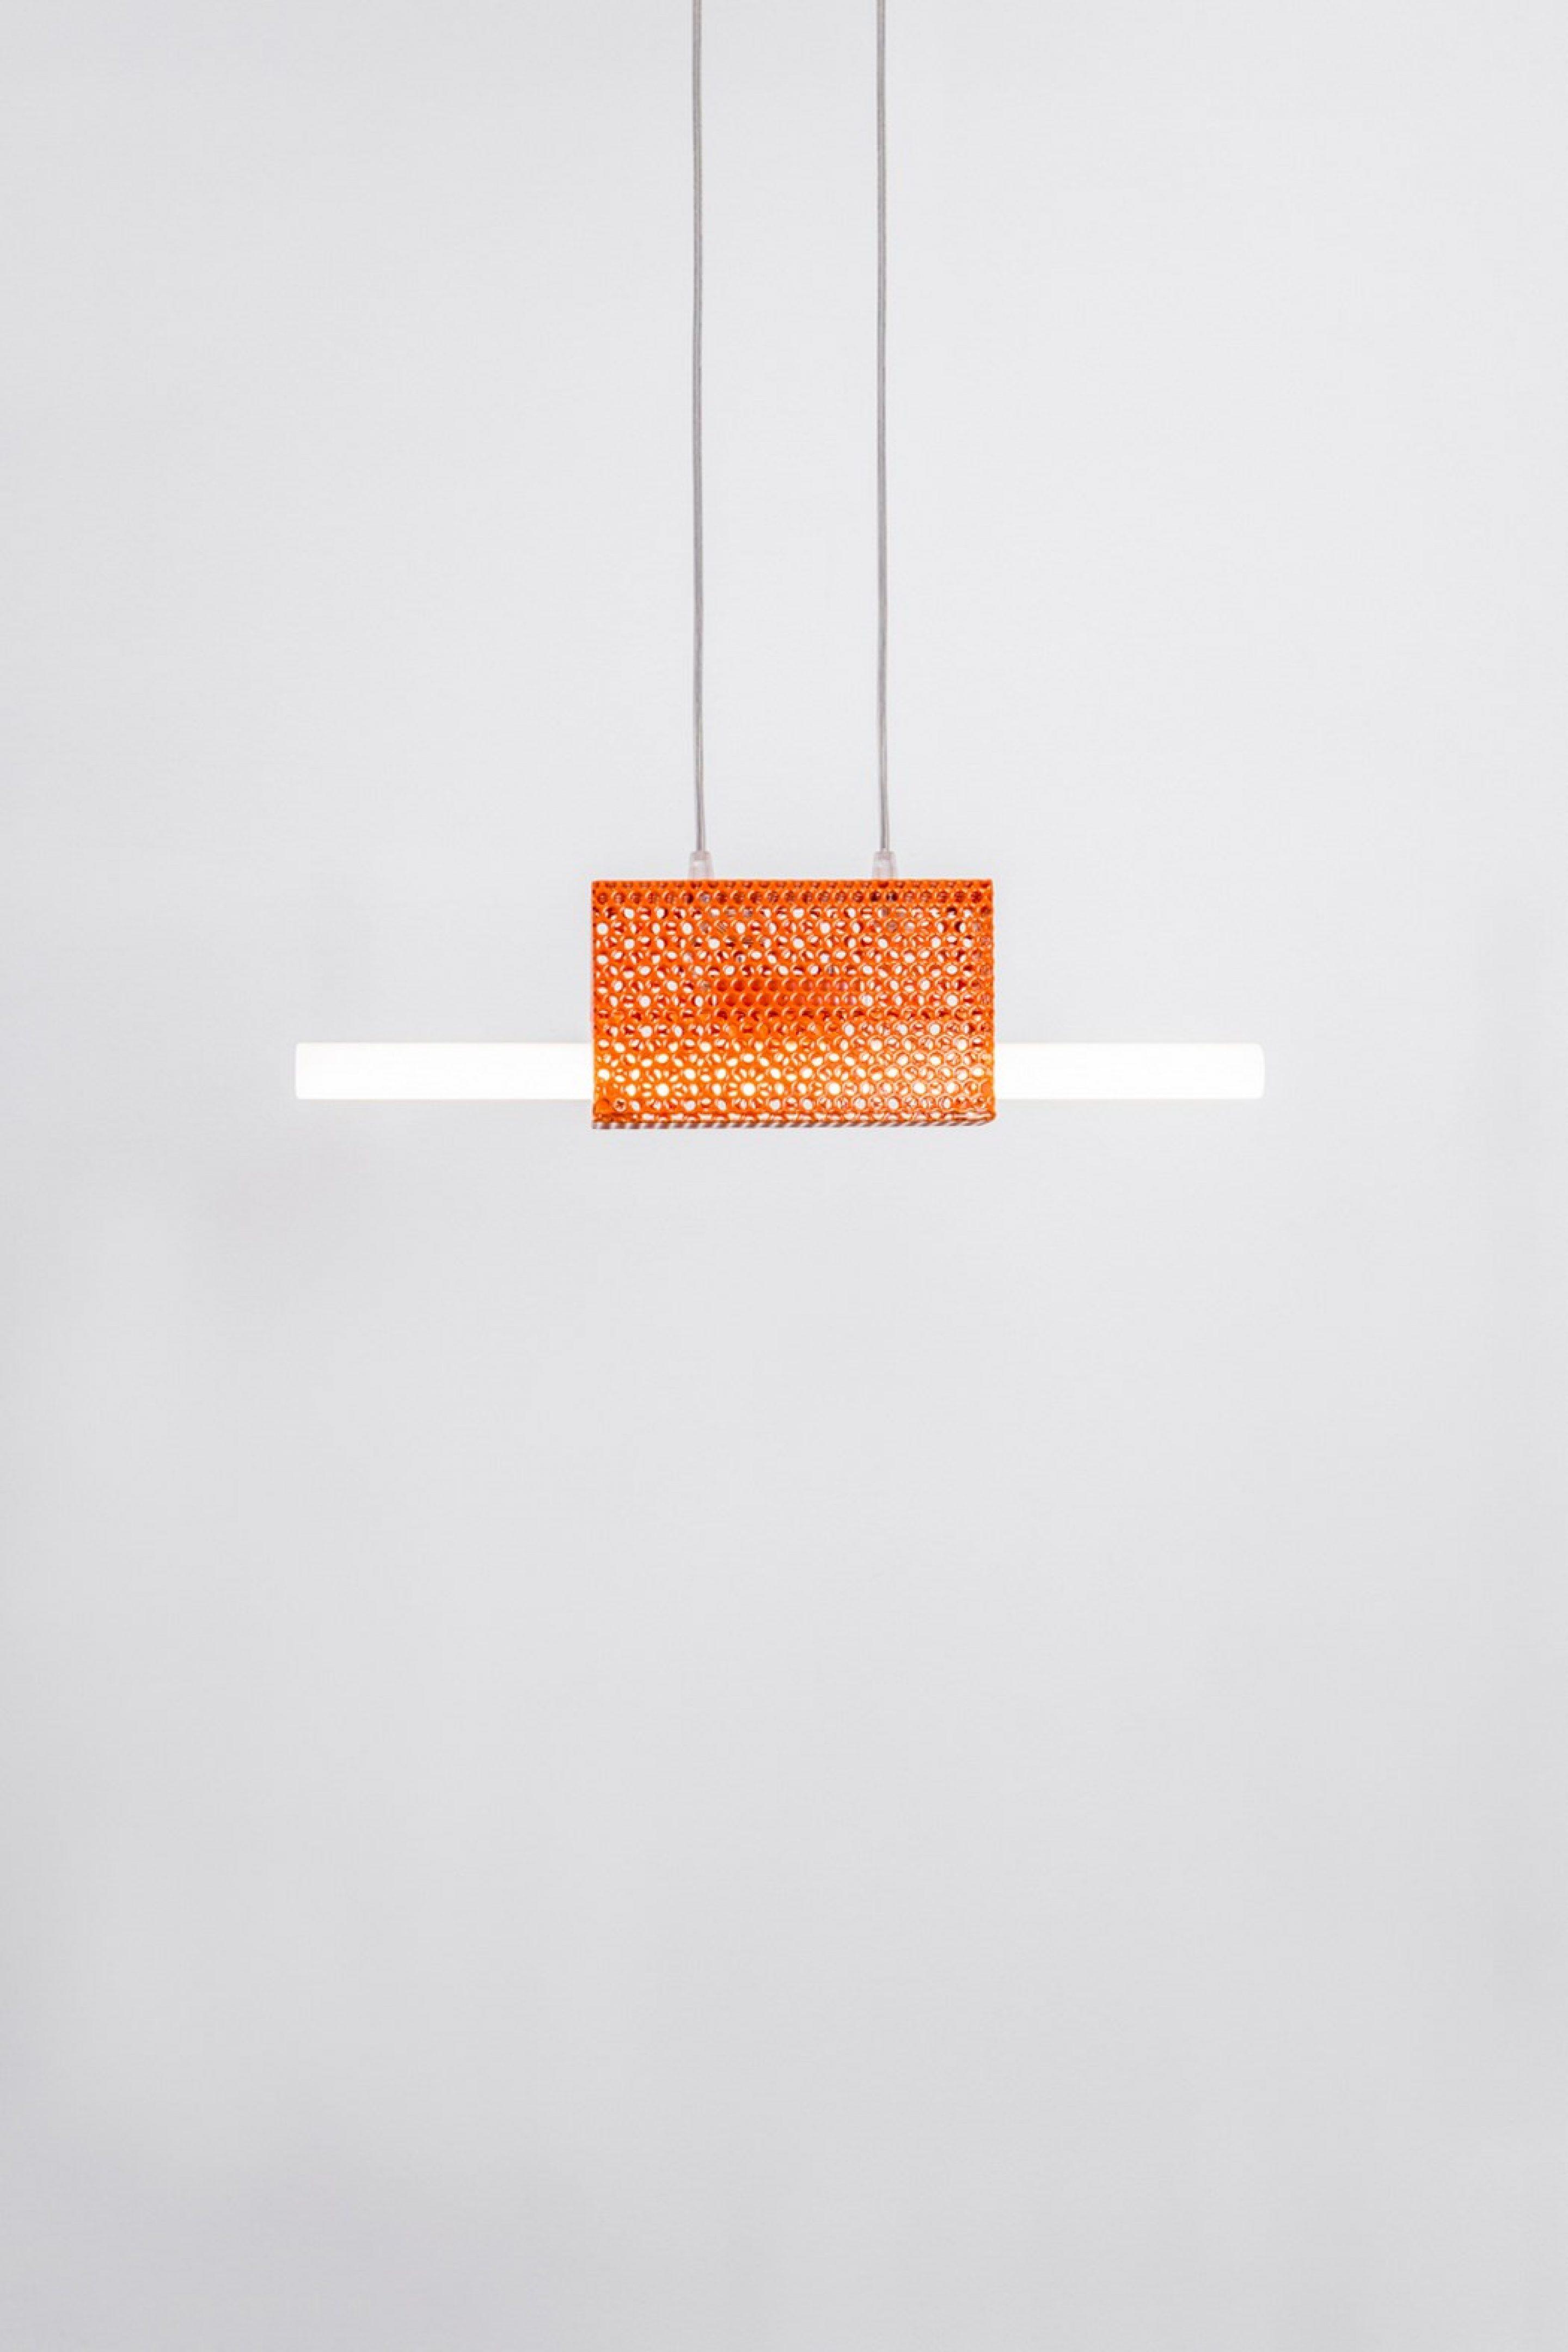 Marta_Ayla_Design (3)